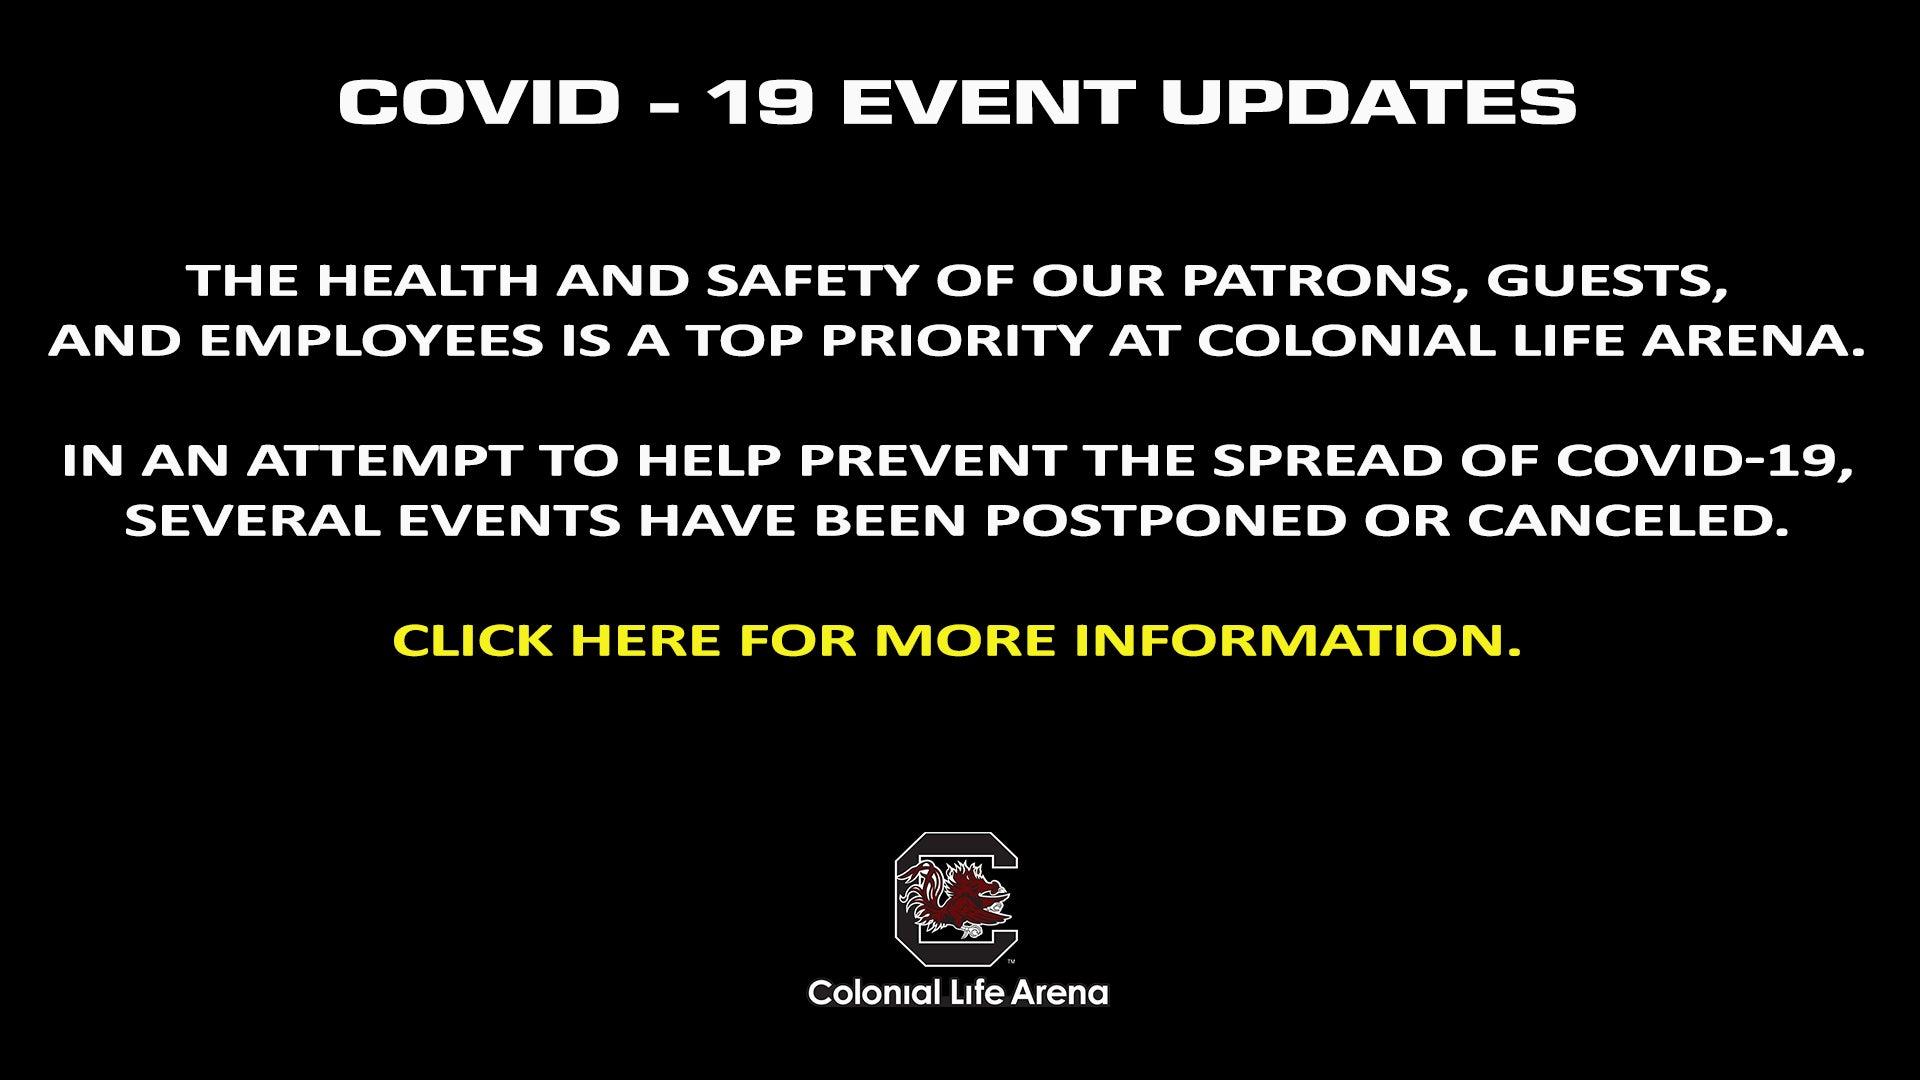 Covid-19 updates 3-24.jpg